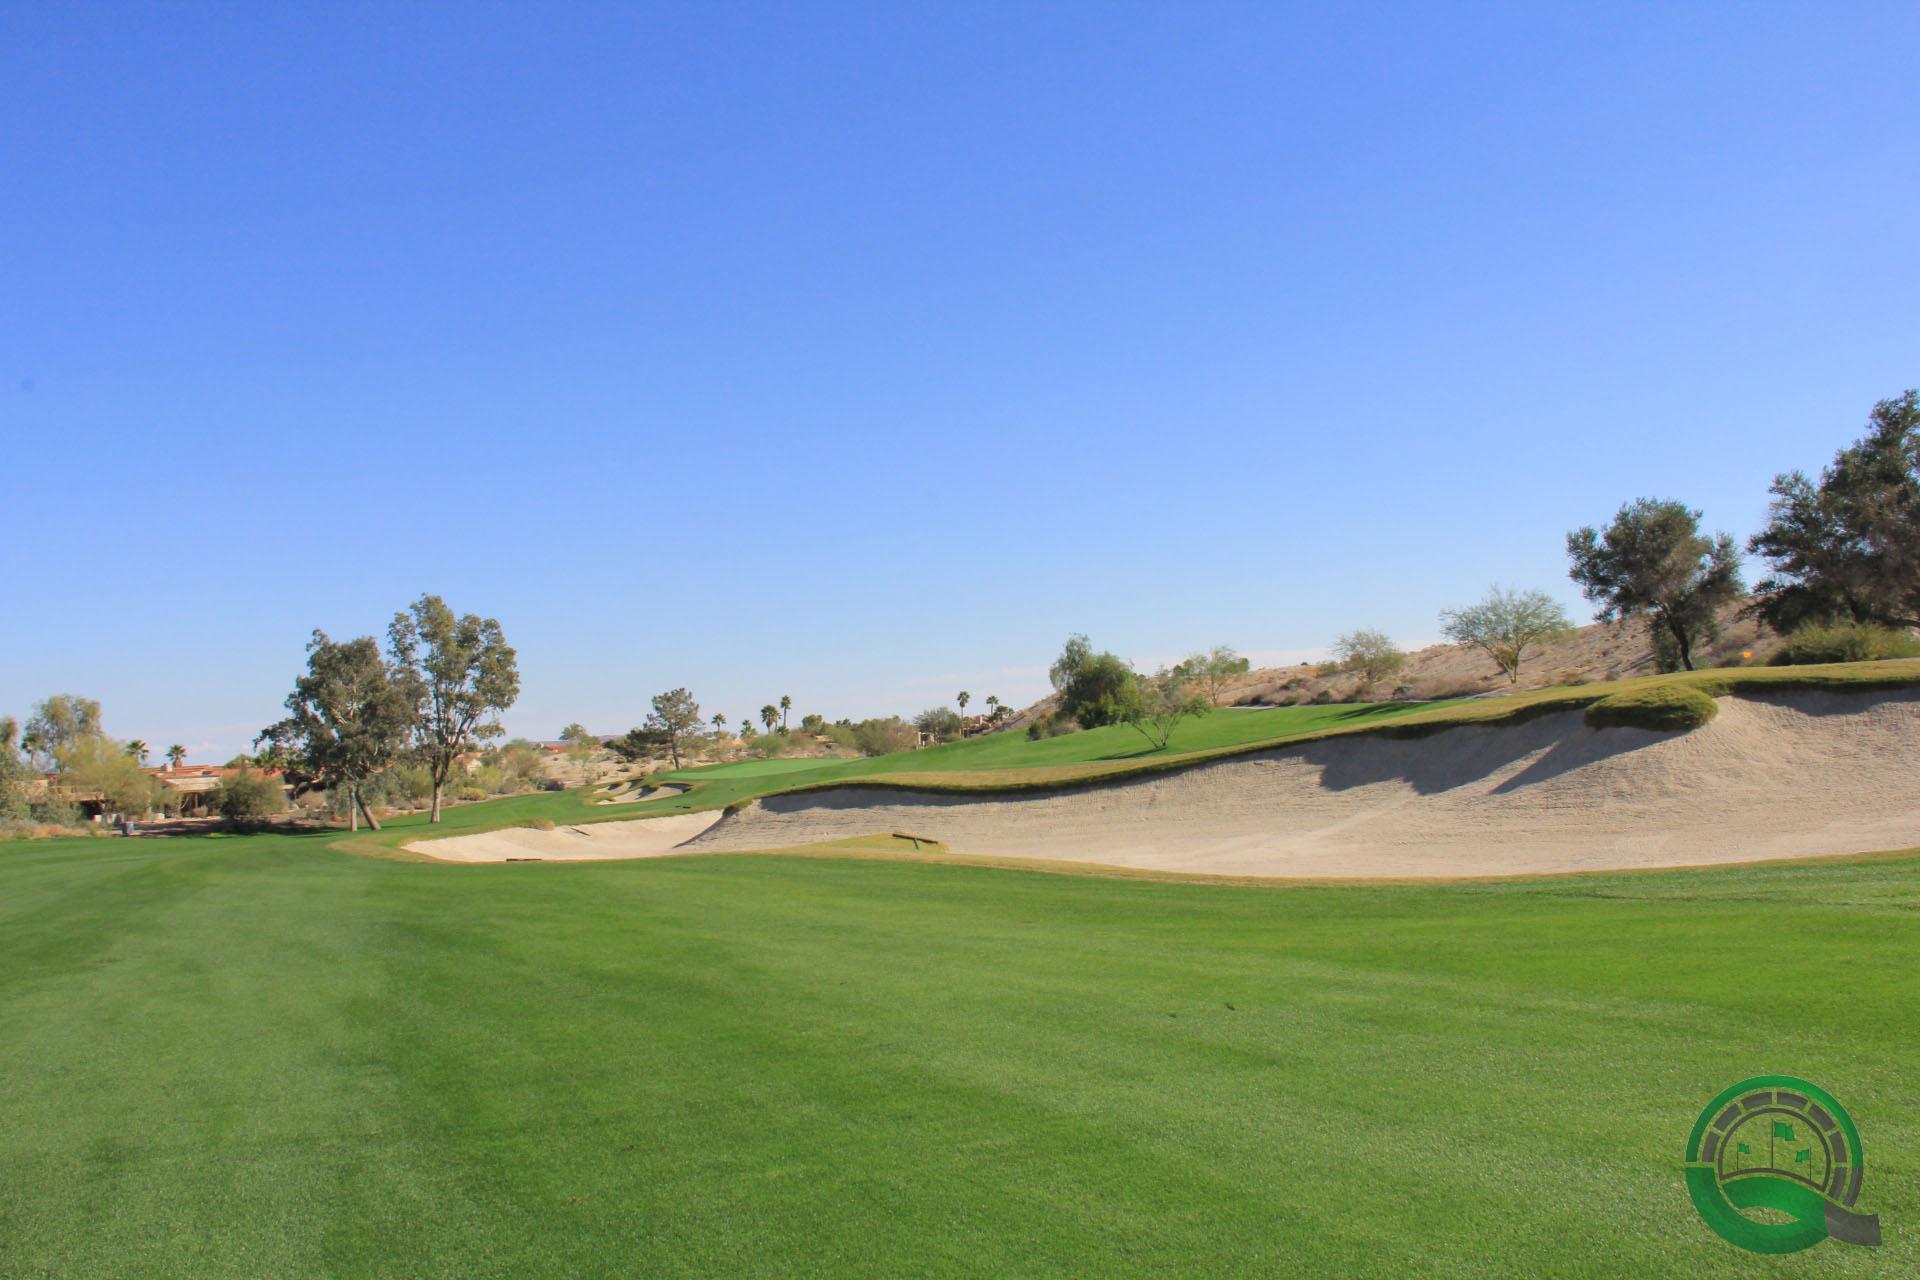 Rams Hill Golf Club Hole 3 Fairway